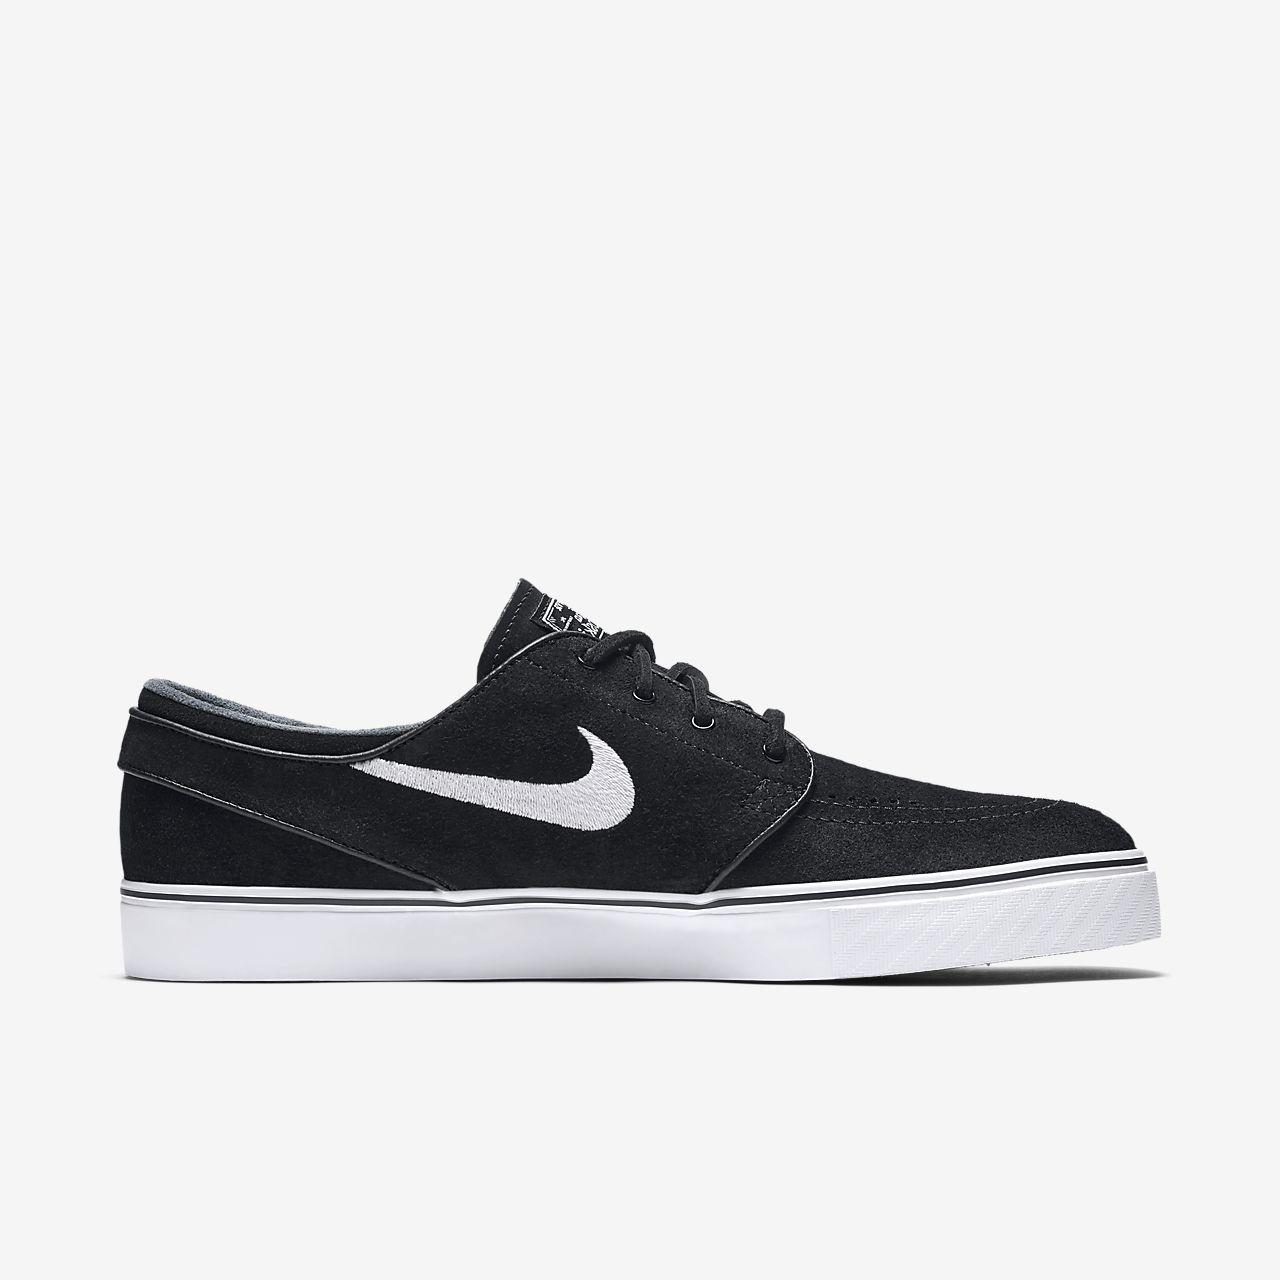 Acheter Nike Chaussures Application En Ligne Australie véritable vente 37CYKy